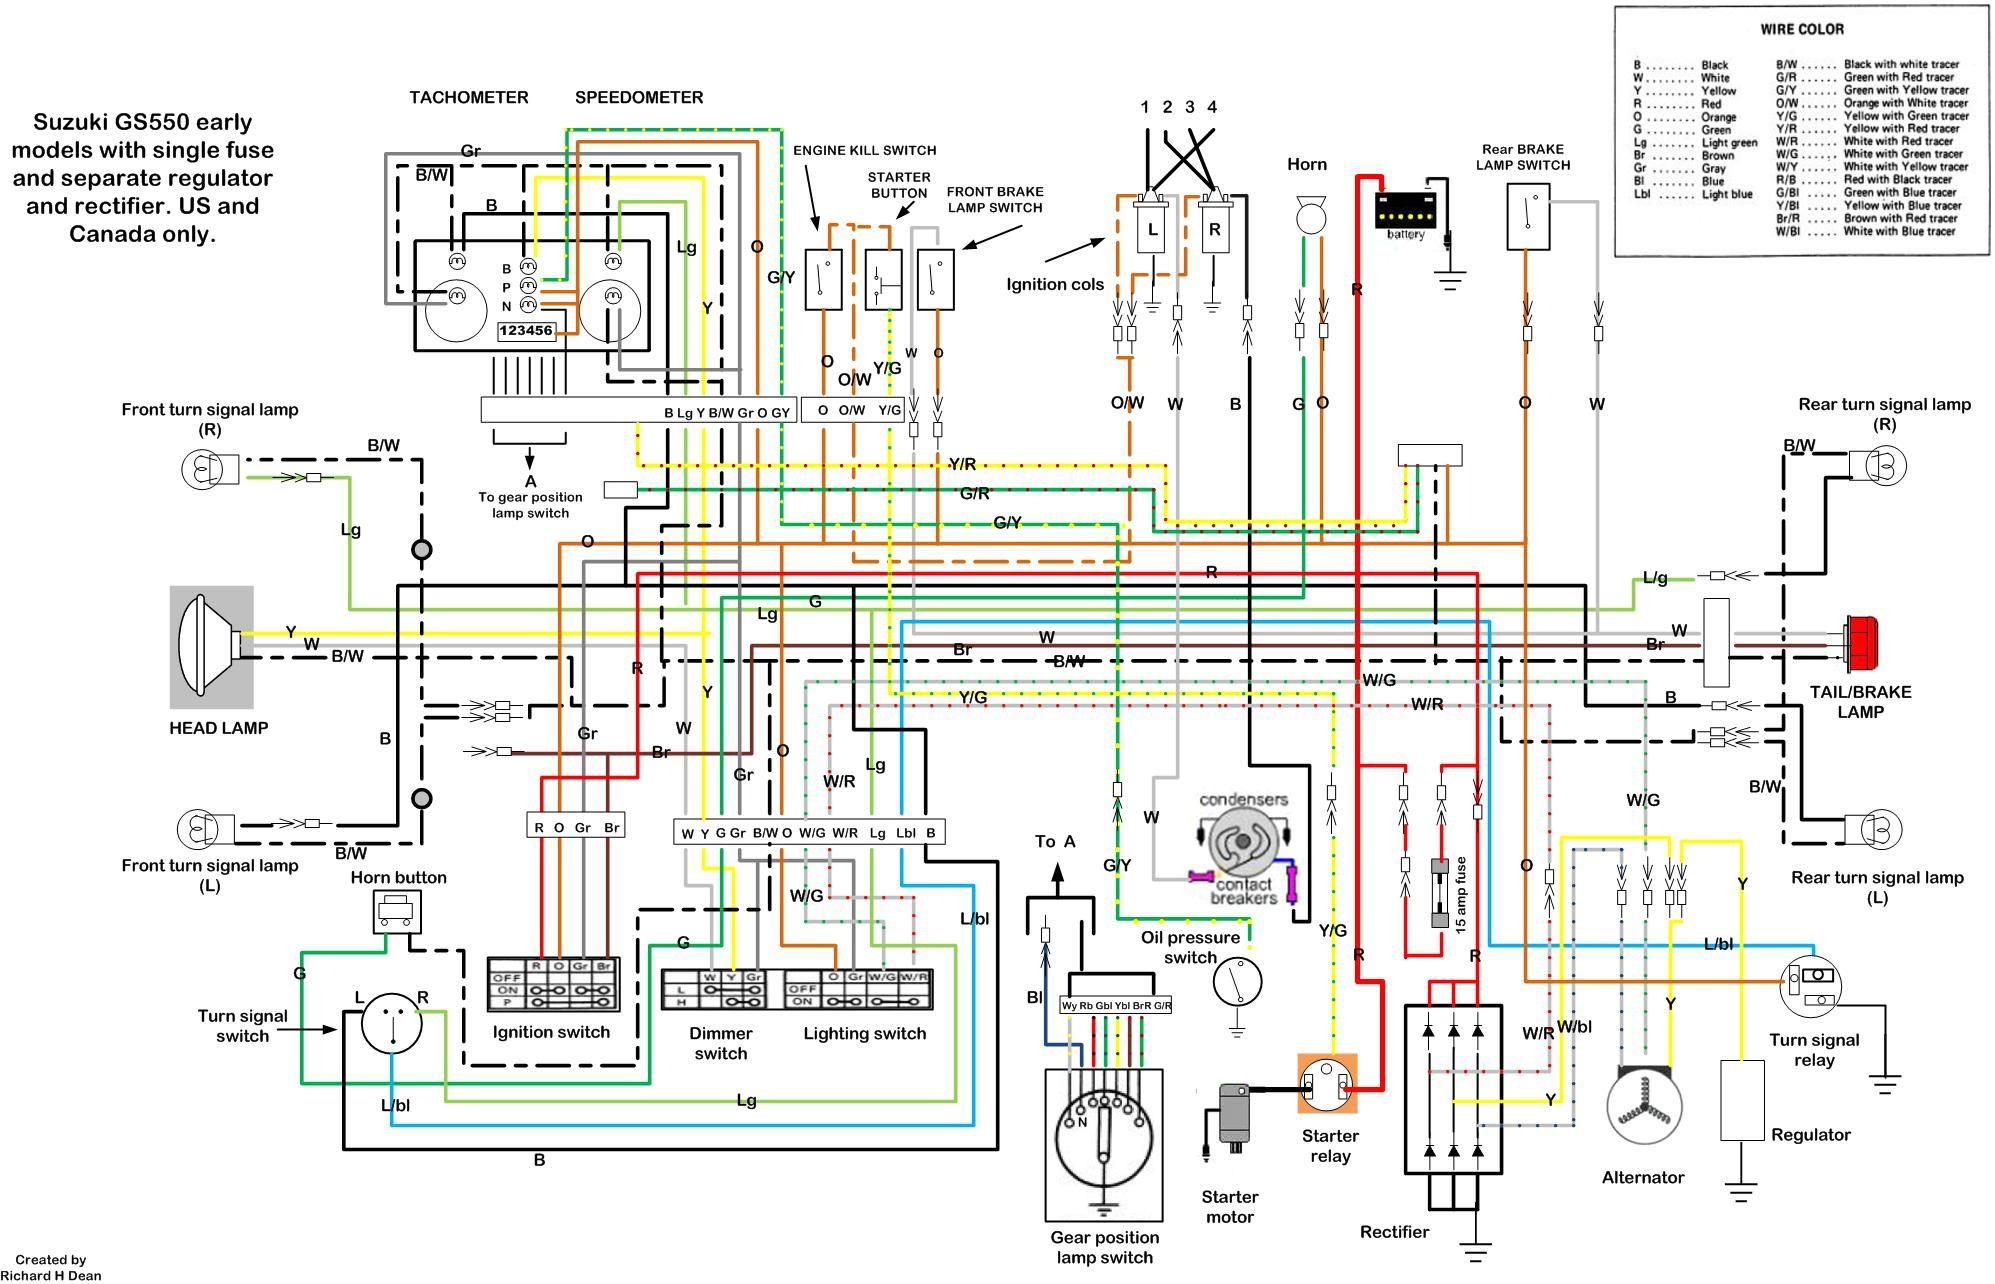 1981 shovelhead wiring diagram 2008 nissan xterra stereo suzuki gs550 motorsports pinterest